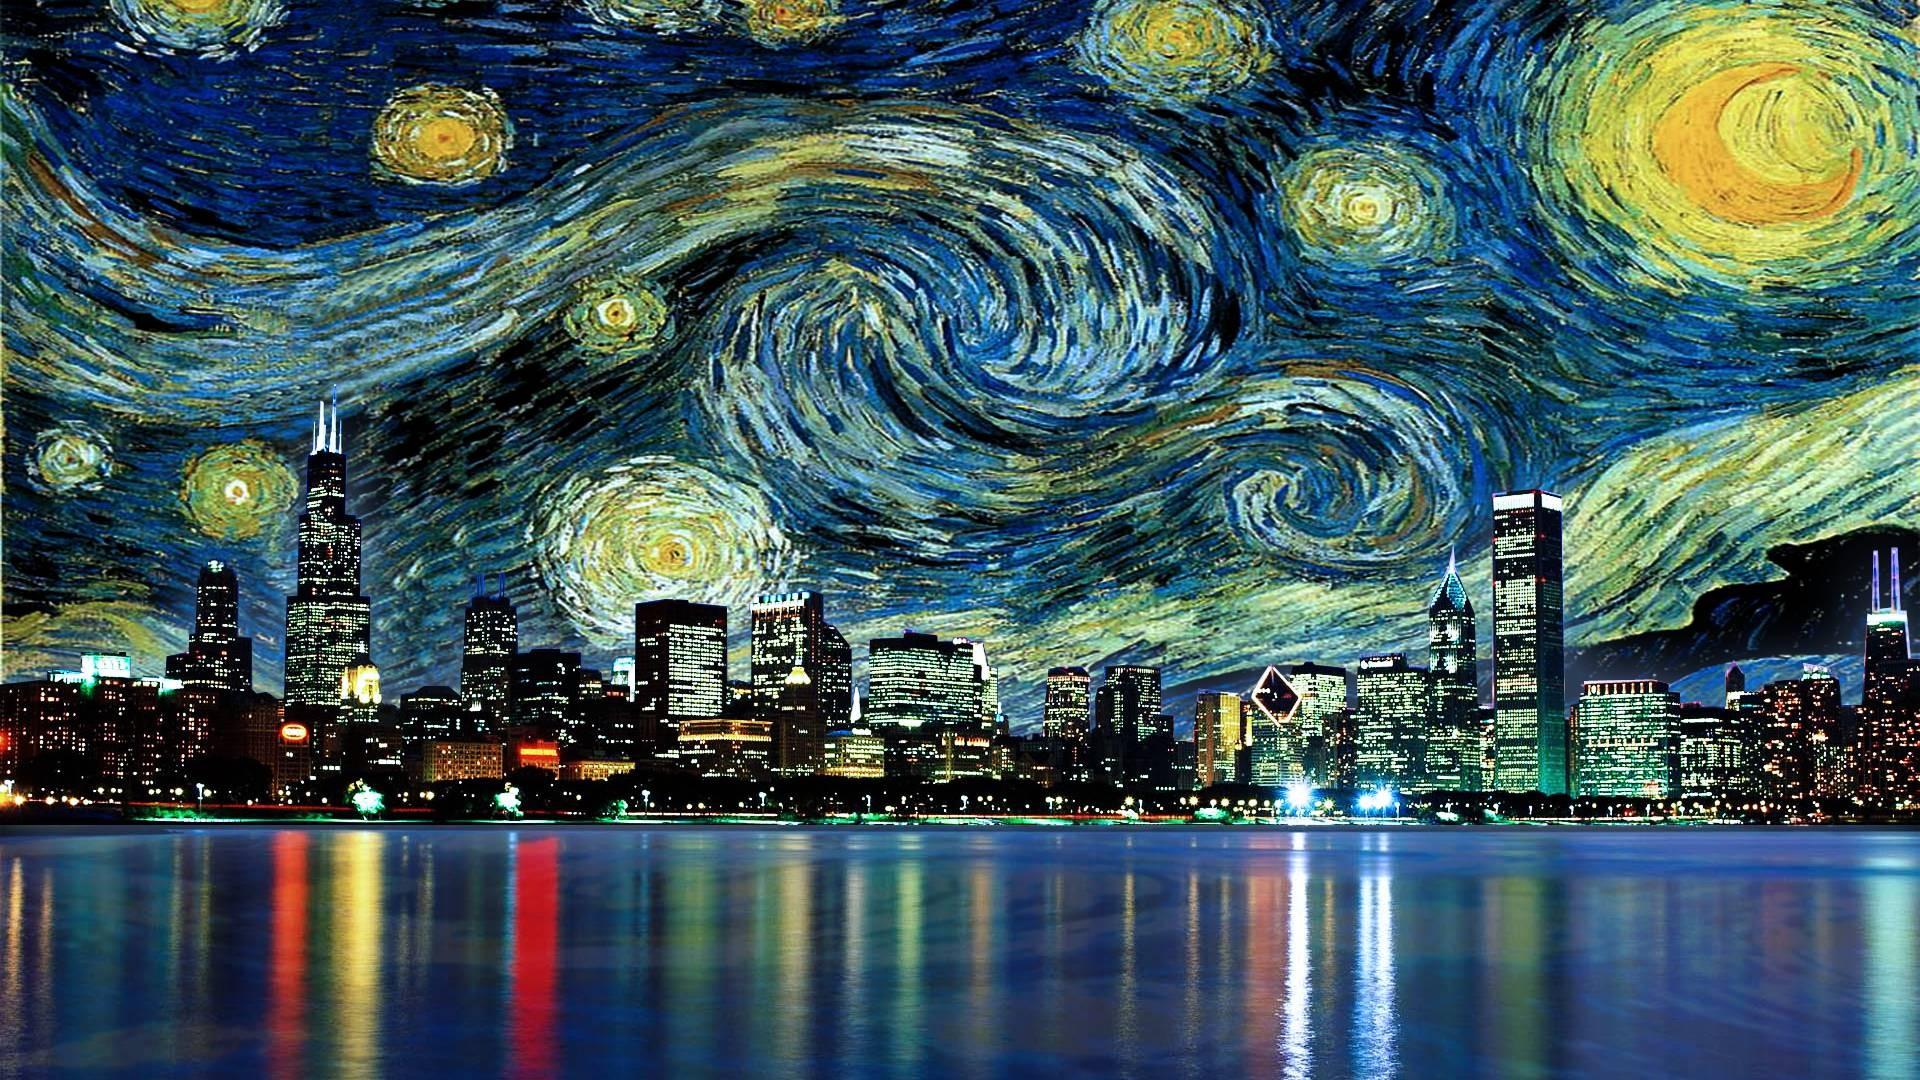 Starry Night wallpaper ·① Download free beautiful High ...